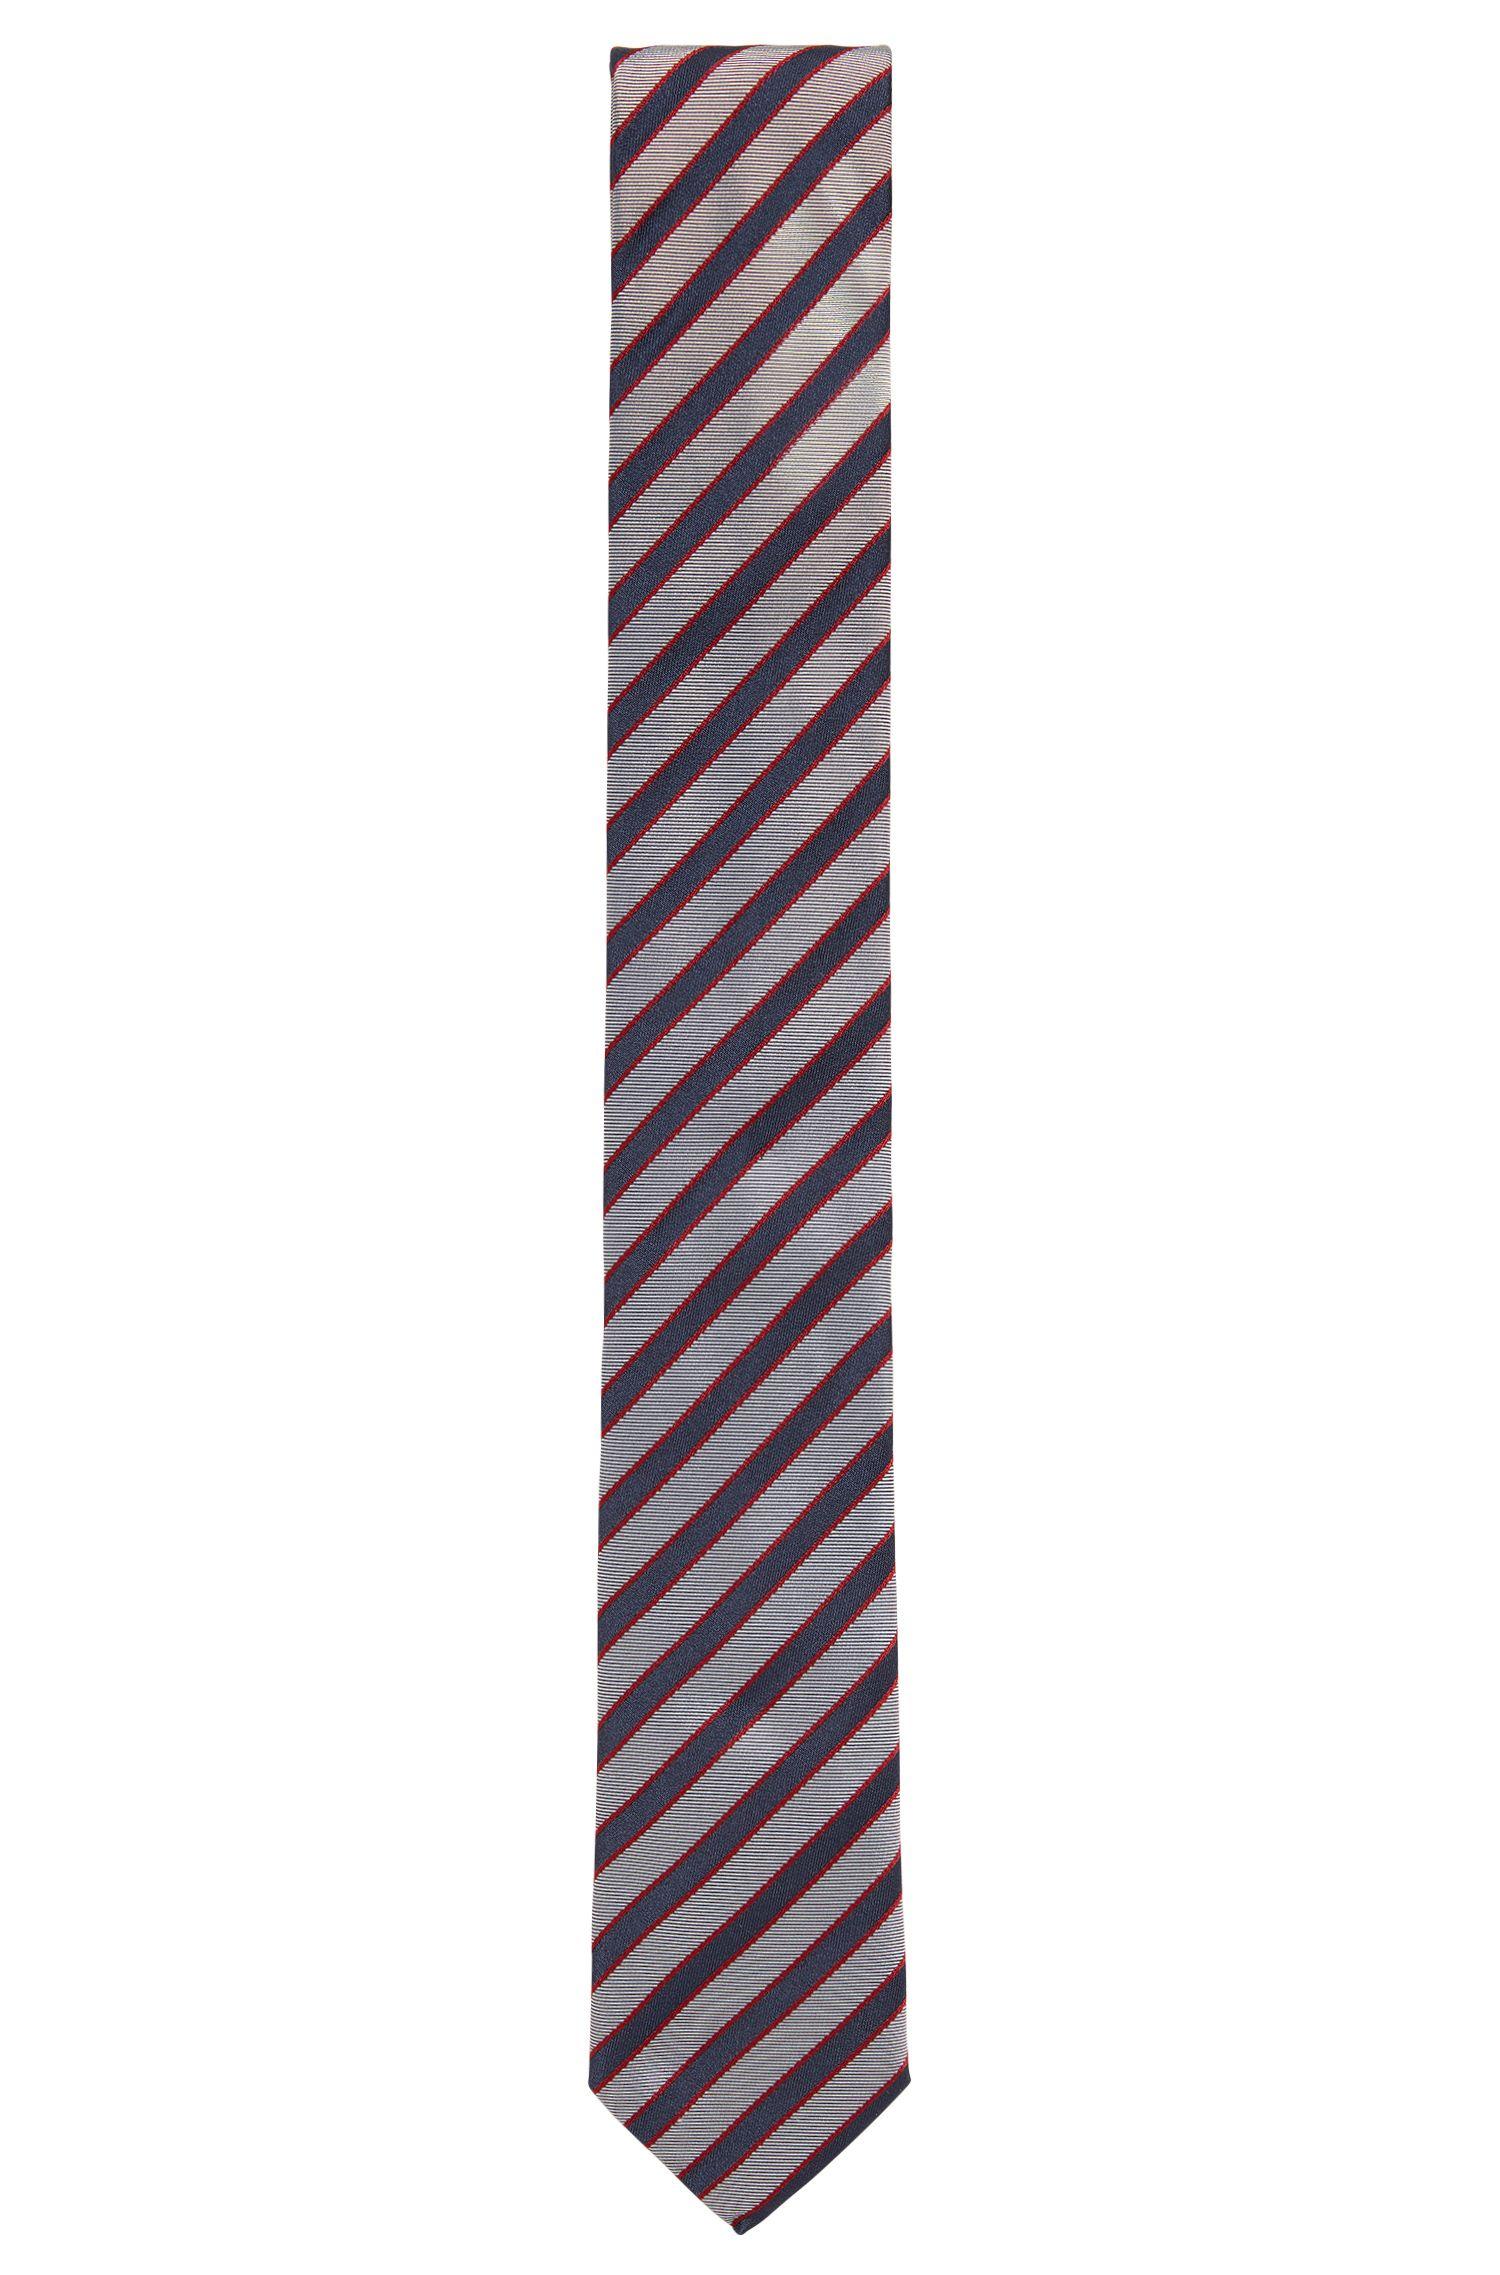 Corbata en jacquard de seda con rayas en diagonal